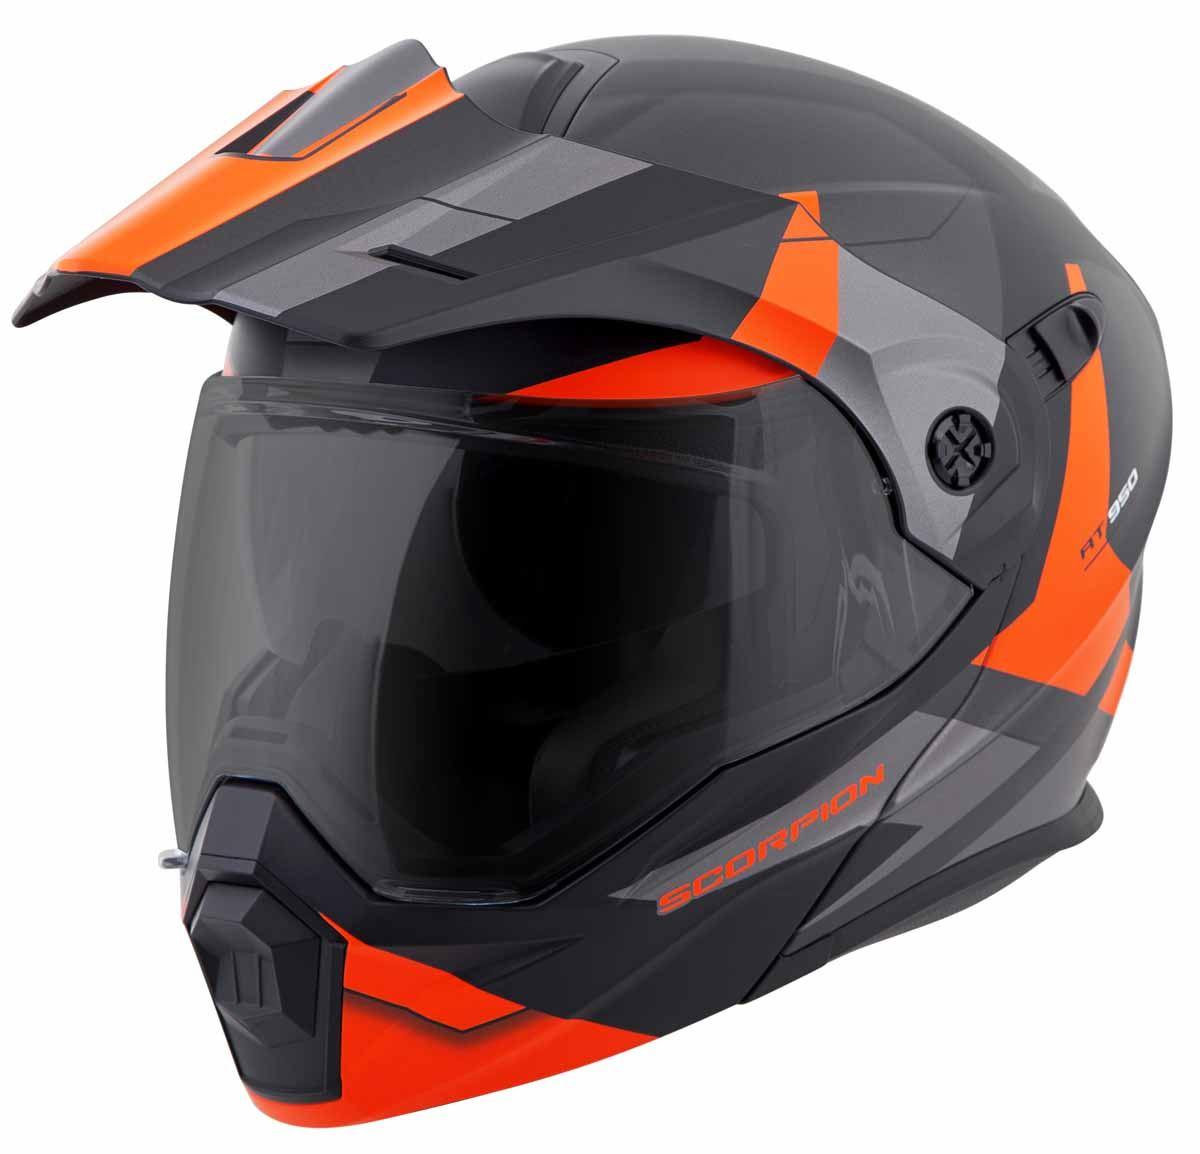 Scorpion-EXO-AT950-Helmet-Flip-Up-Modular-Dual-Sport-Adventure-ADV-DOT-XS-3XL miniature 50